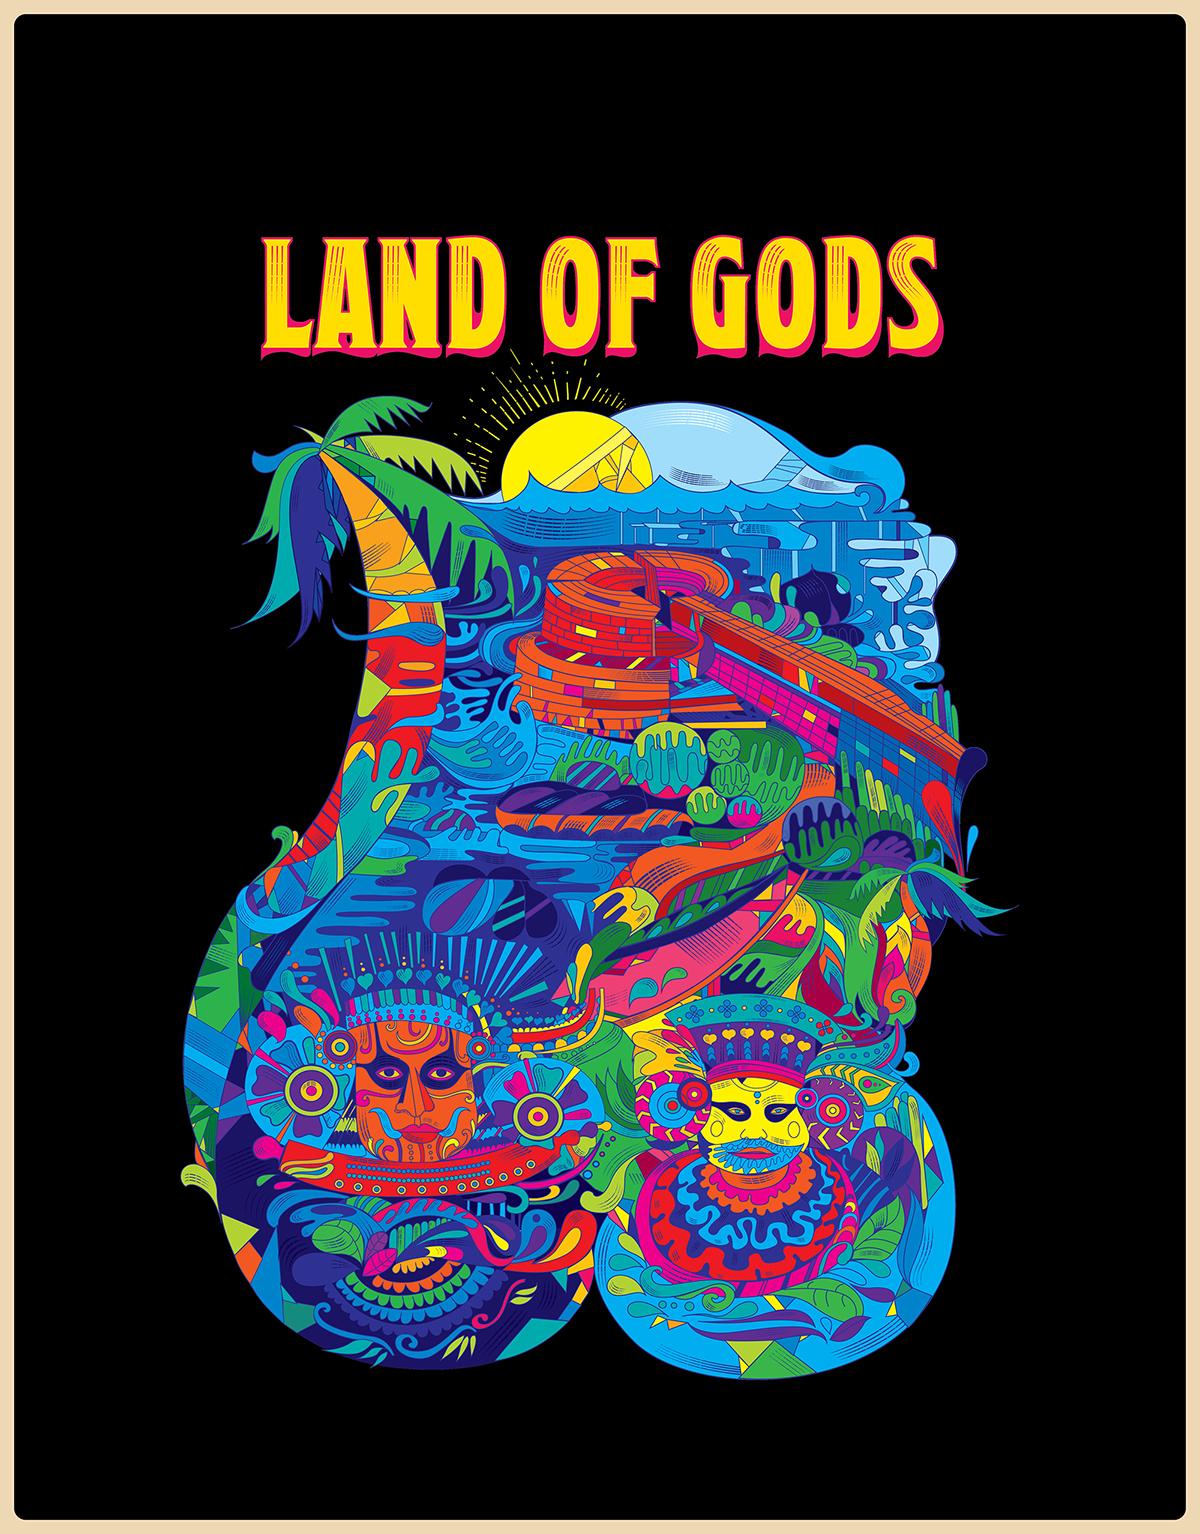 Kerala Blog Express - Trip of a Lifetime by Kerala Tourism   Land of Gods by Stark Communications Pvt Ltd